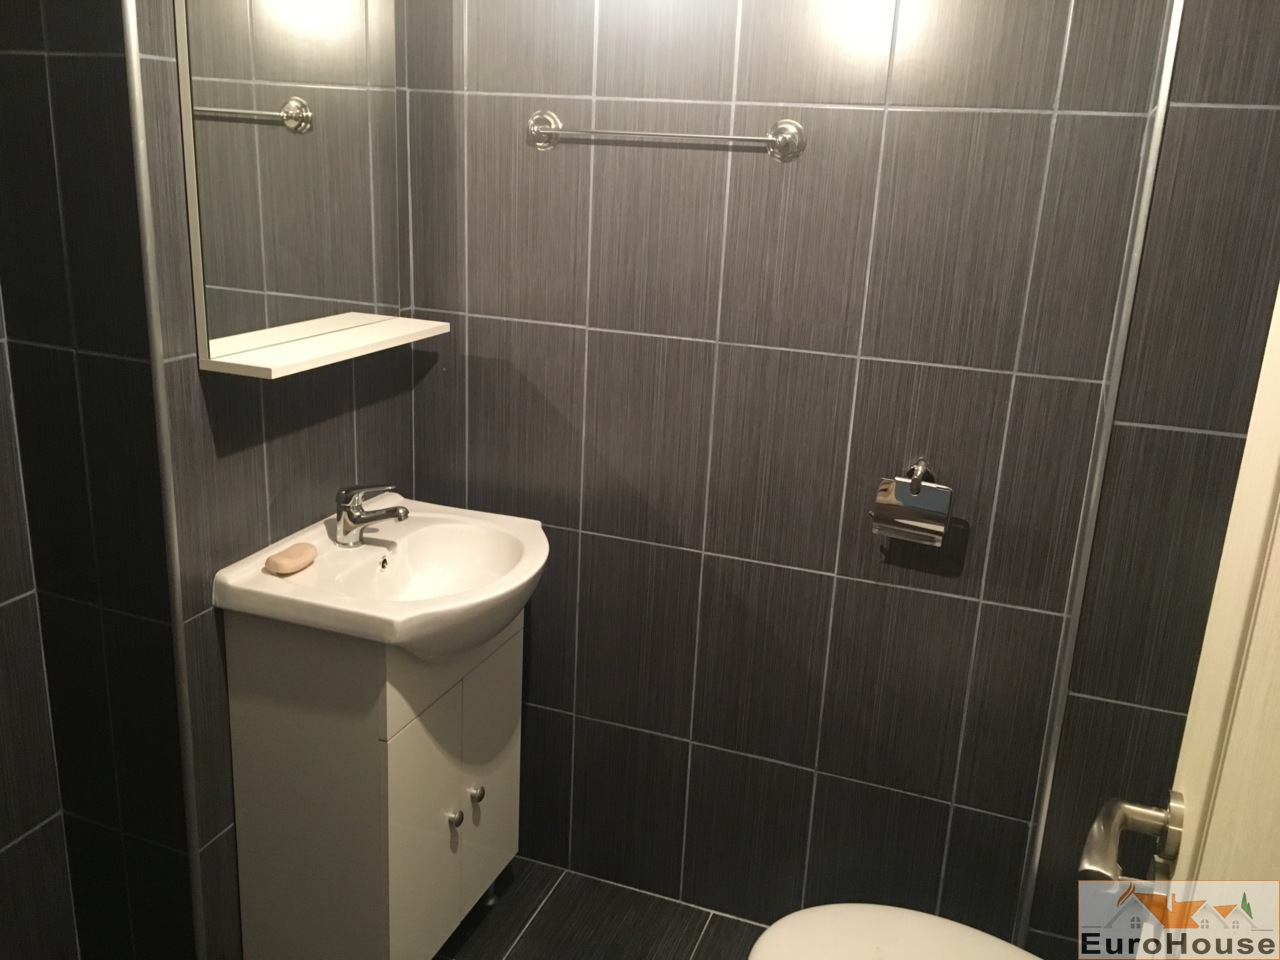 Apartament de vanzare 3 camere  Alba Iulia-33804-